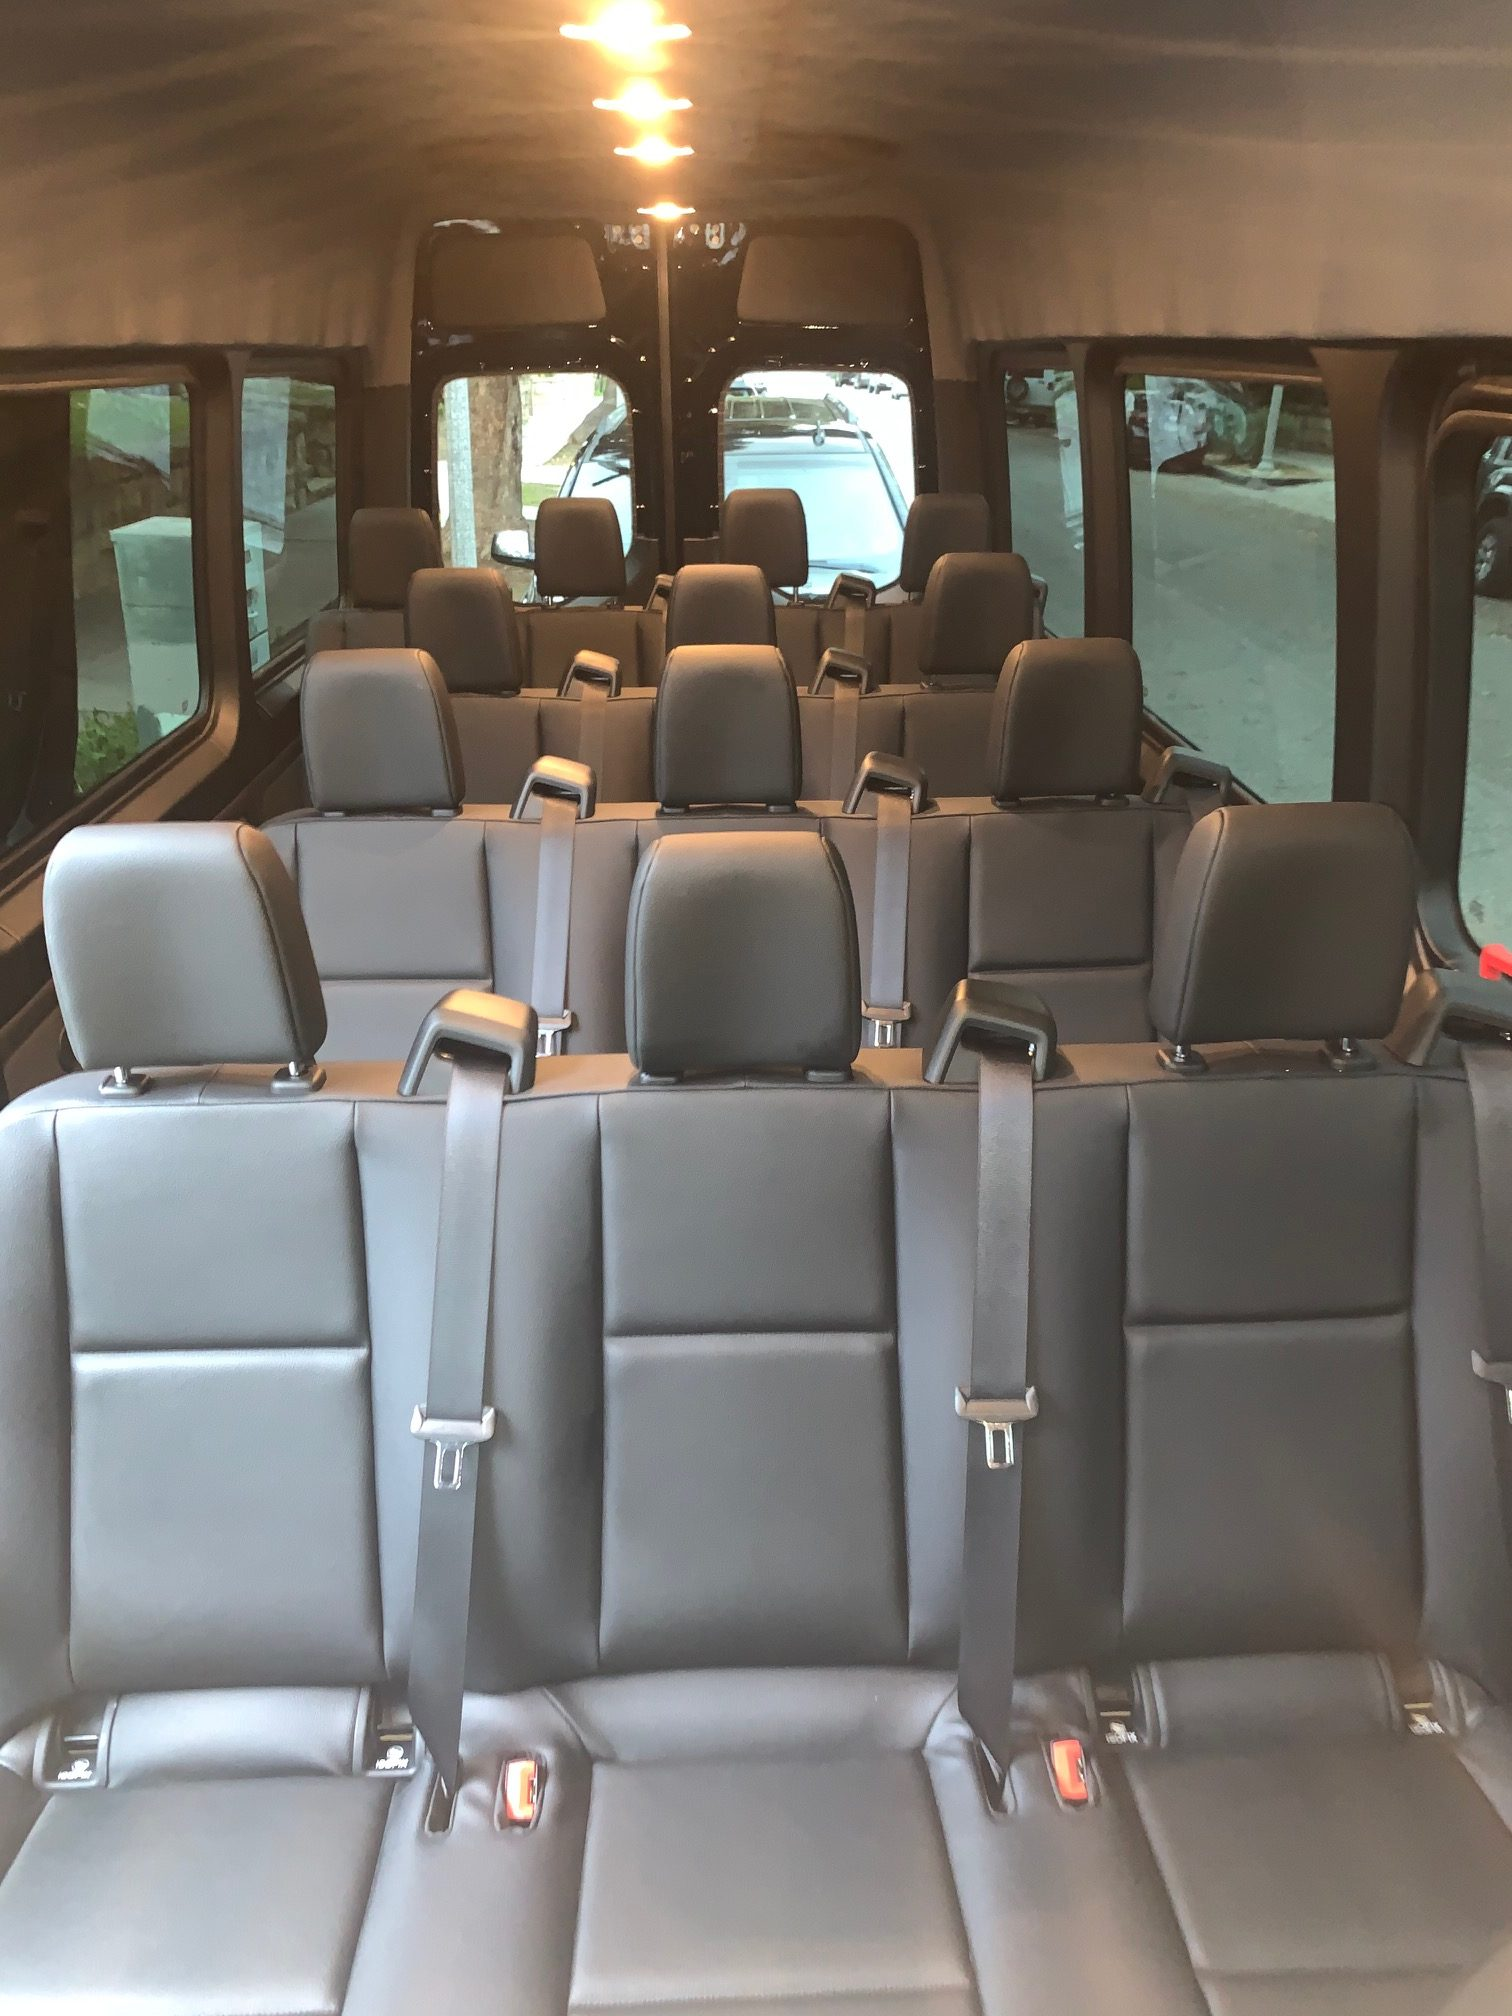 Mercedes Sprinter, 15 passenger